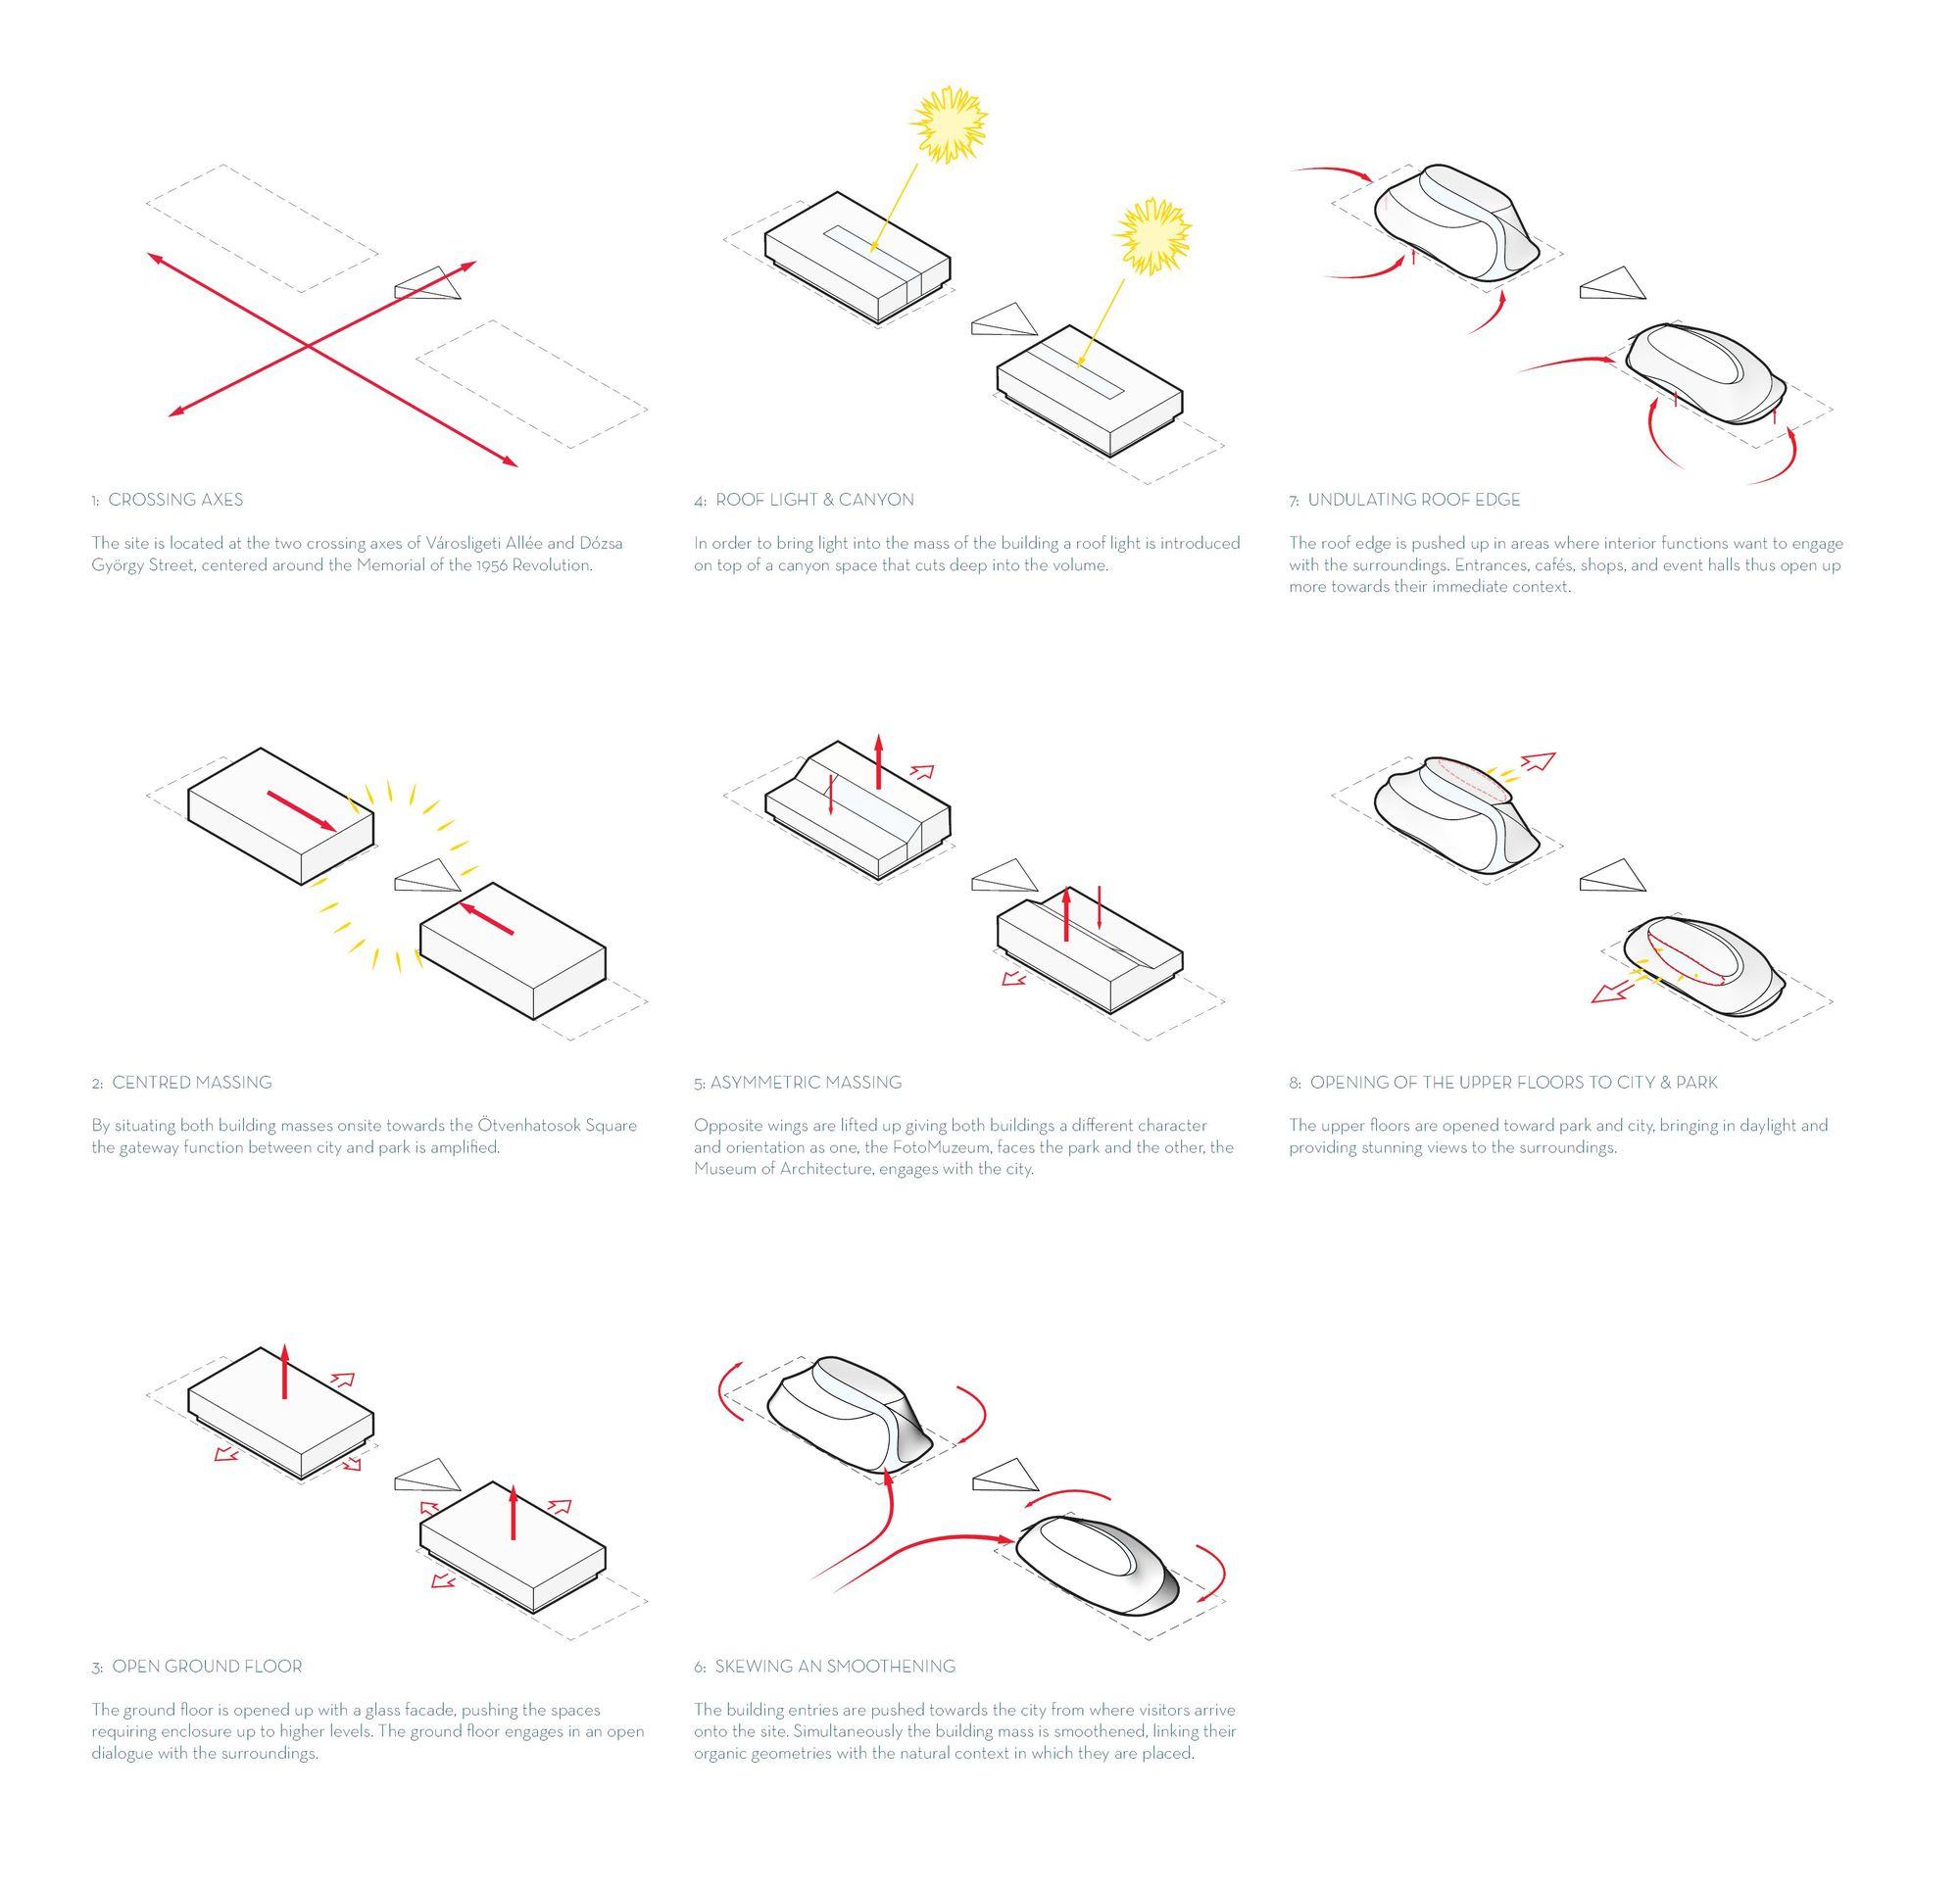 Pin By Franshelys Hernandez On Parti Diagrams